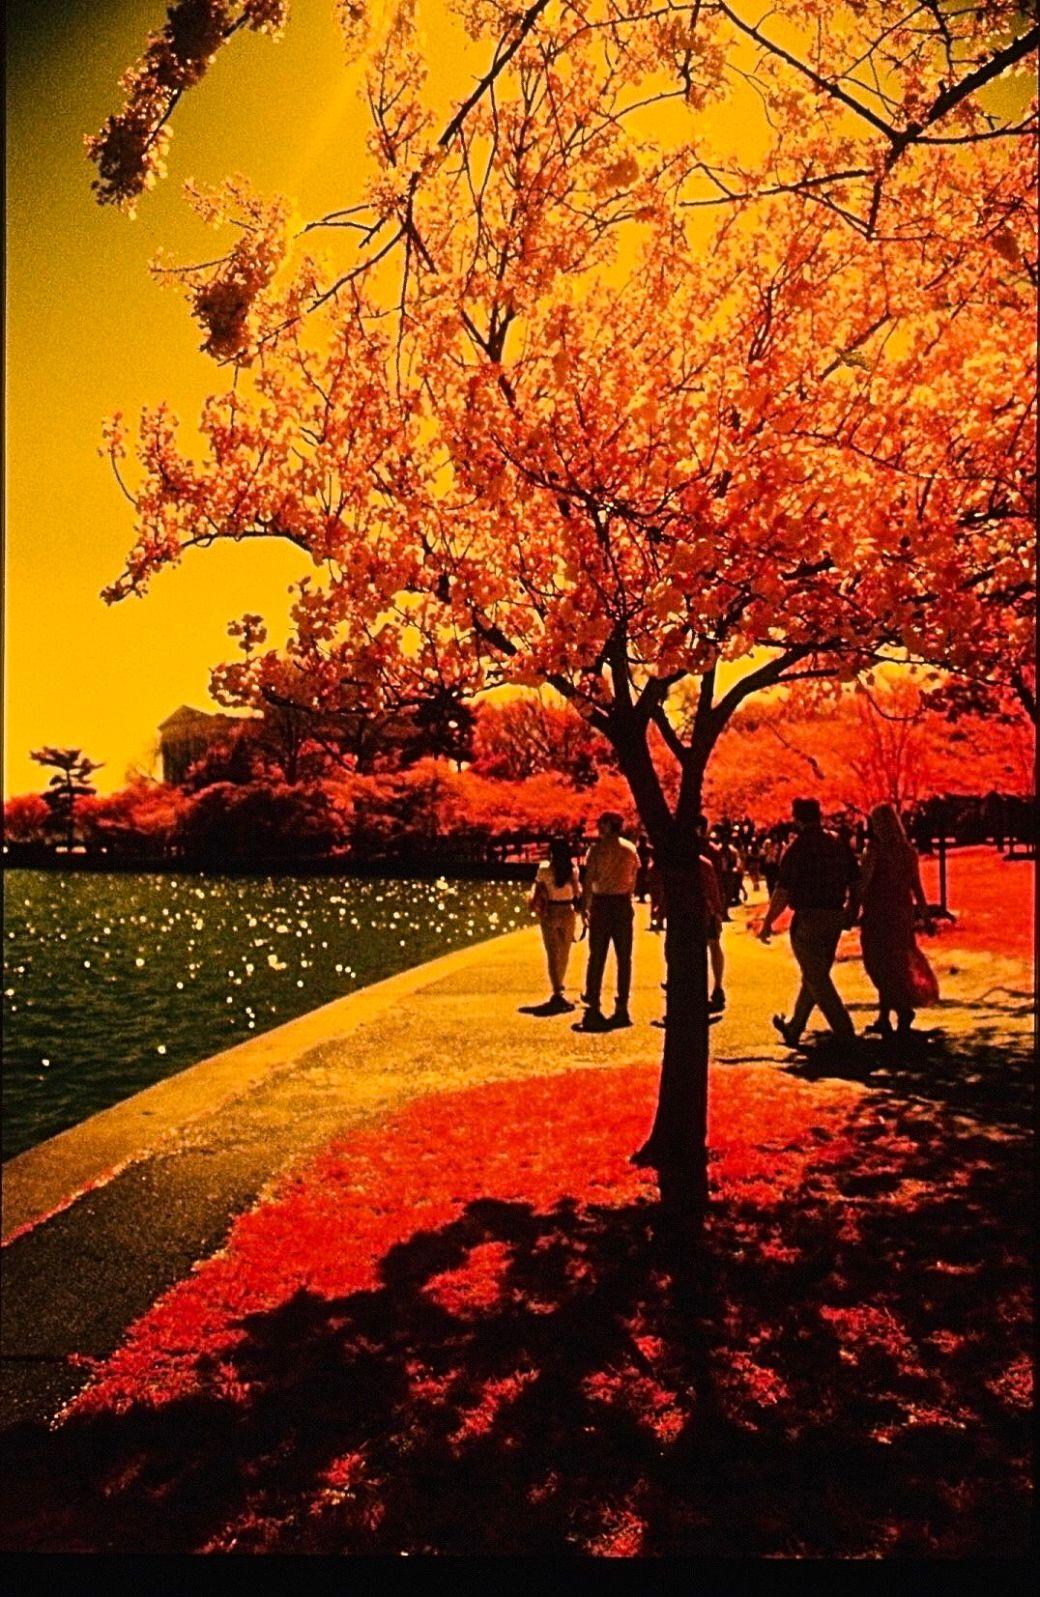 washington dc cherry blossoms color infrared film 2001 6